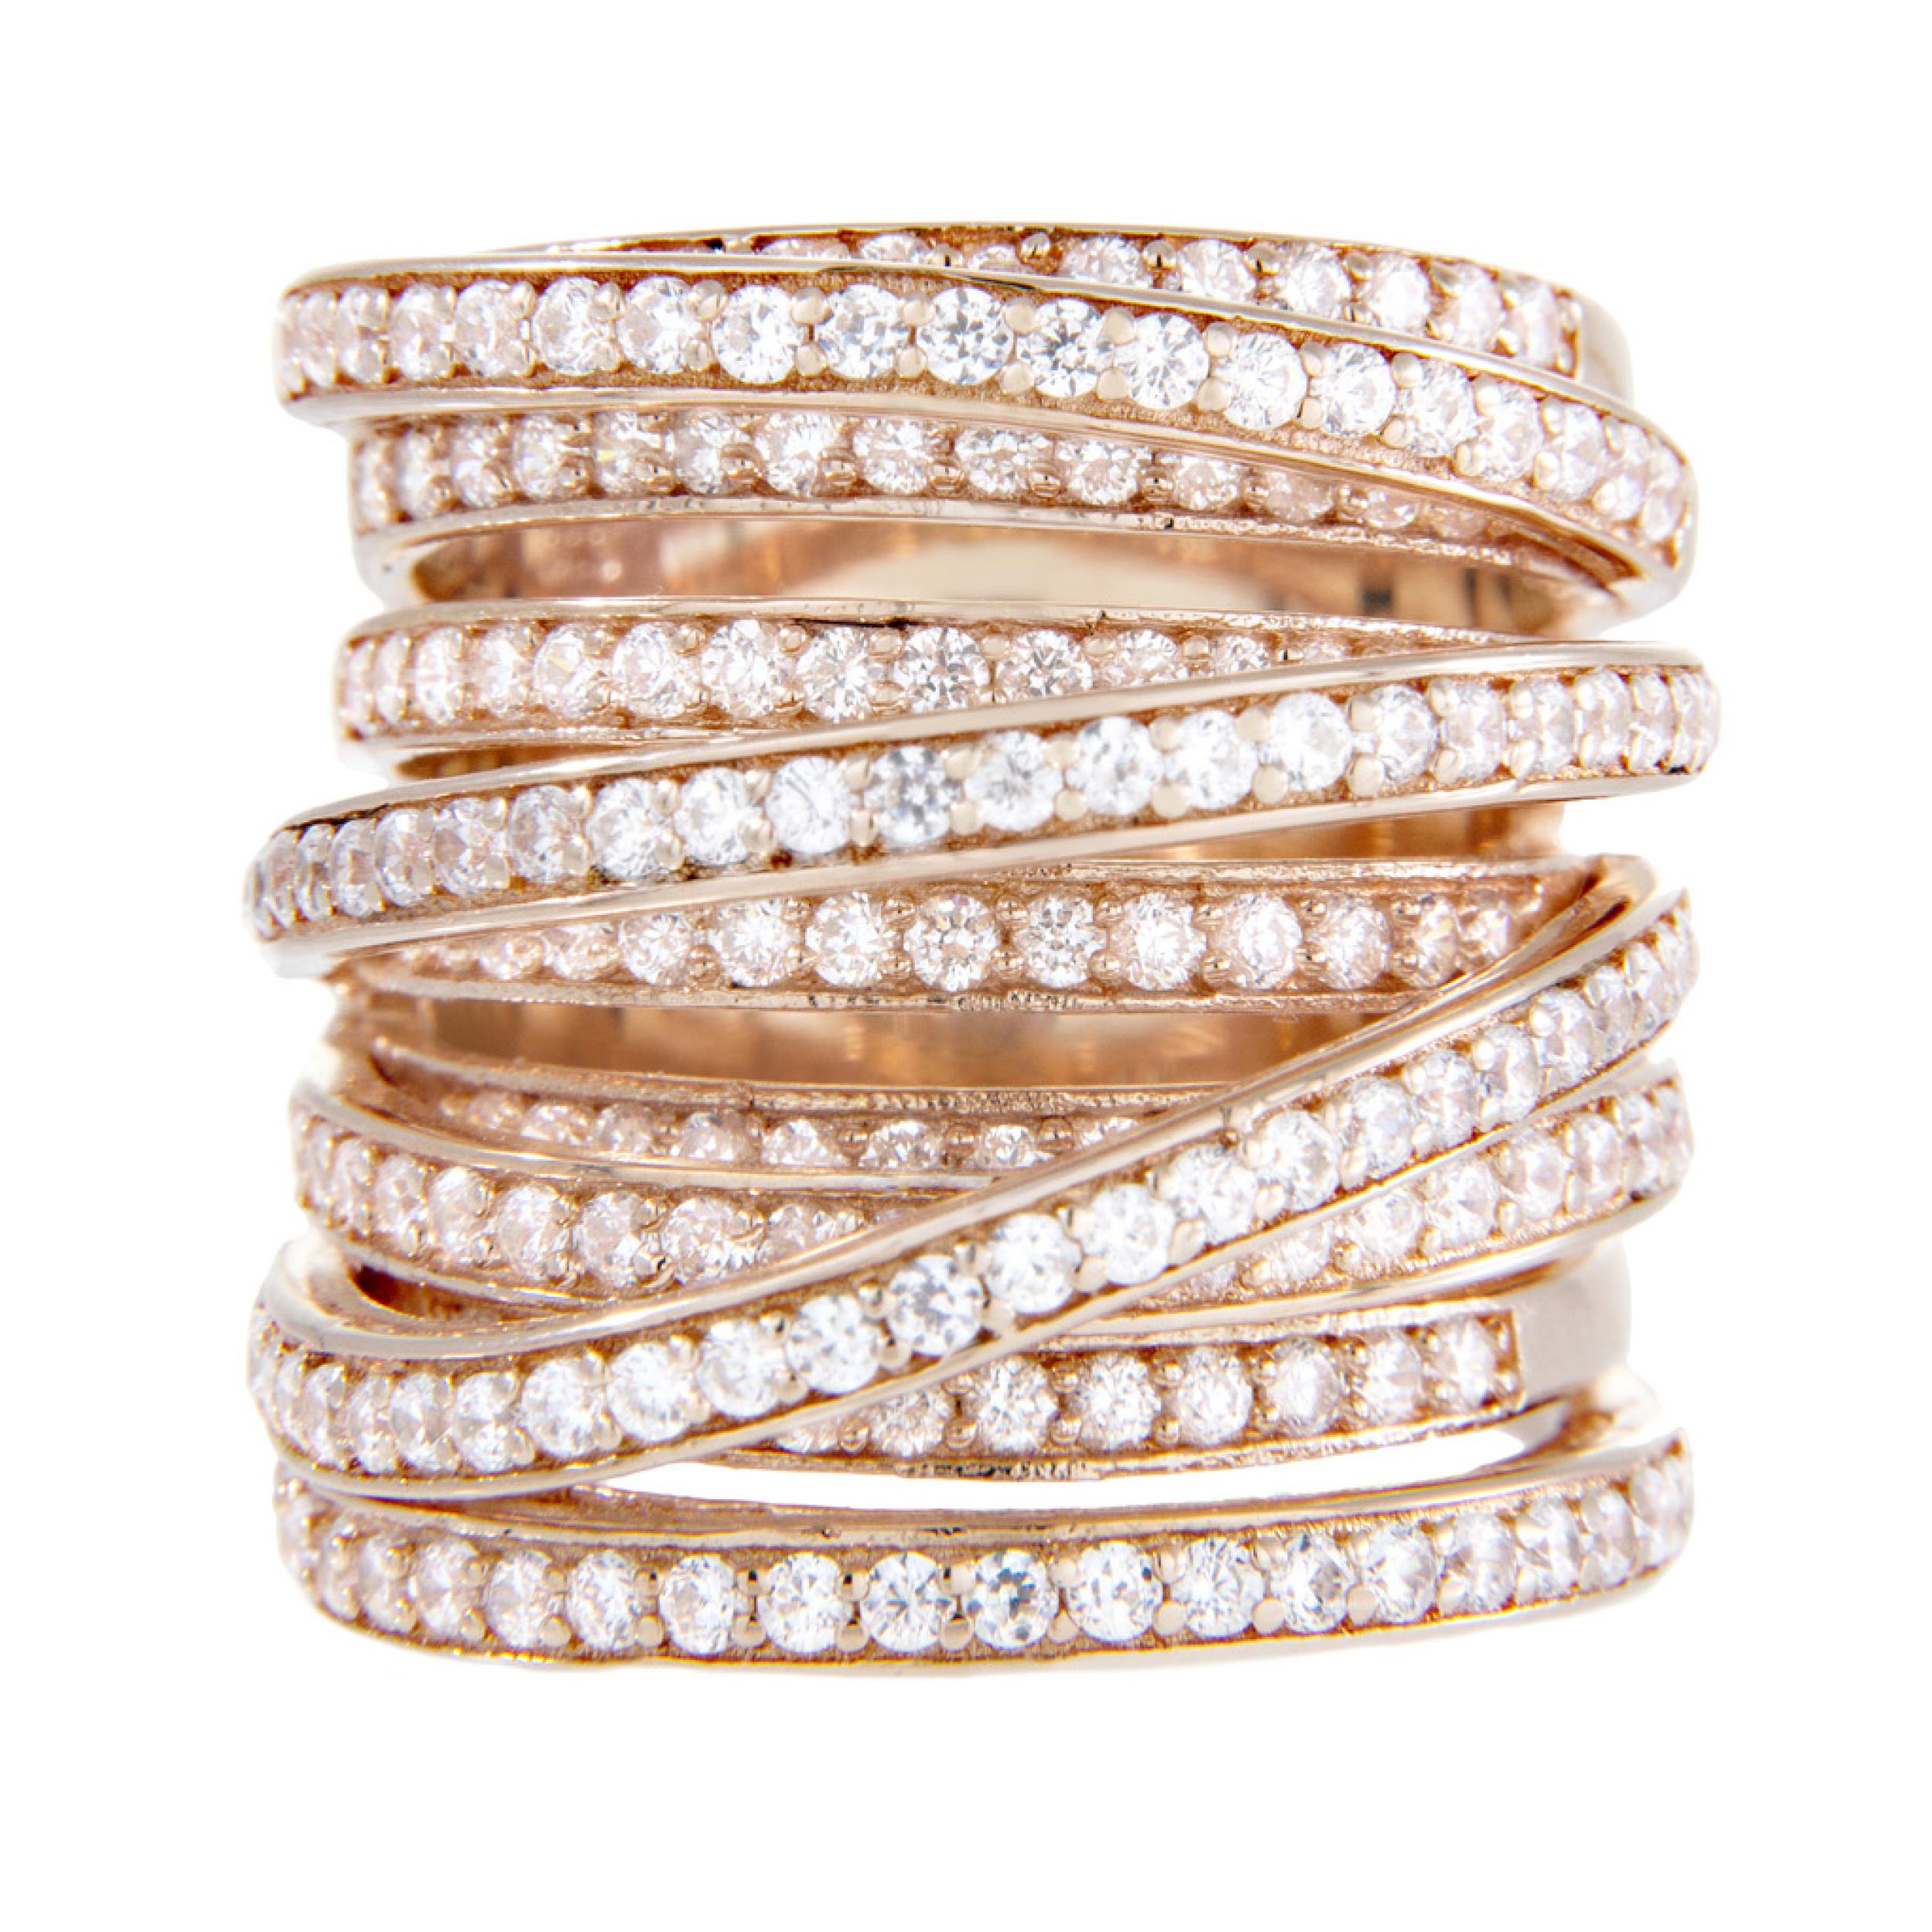 Rings by Bronzallure - from Originals Jewellers & Gallery